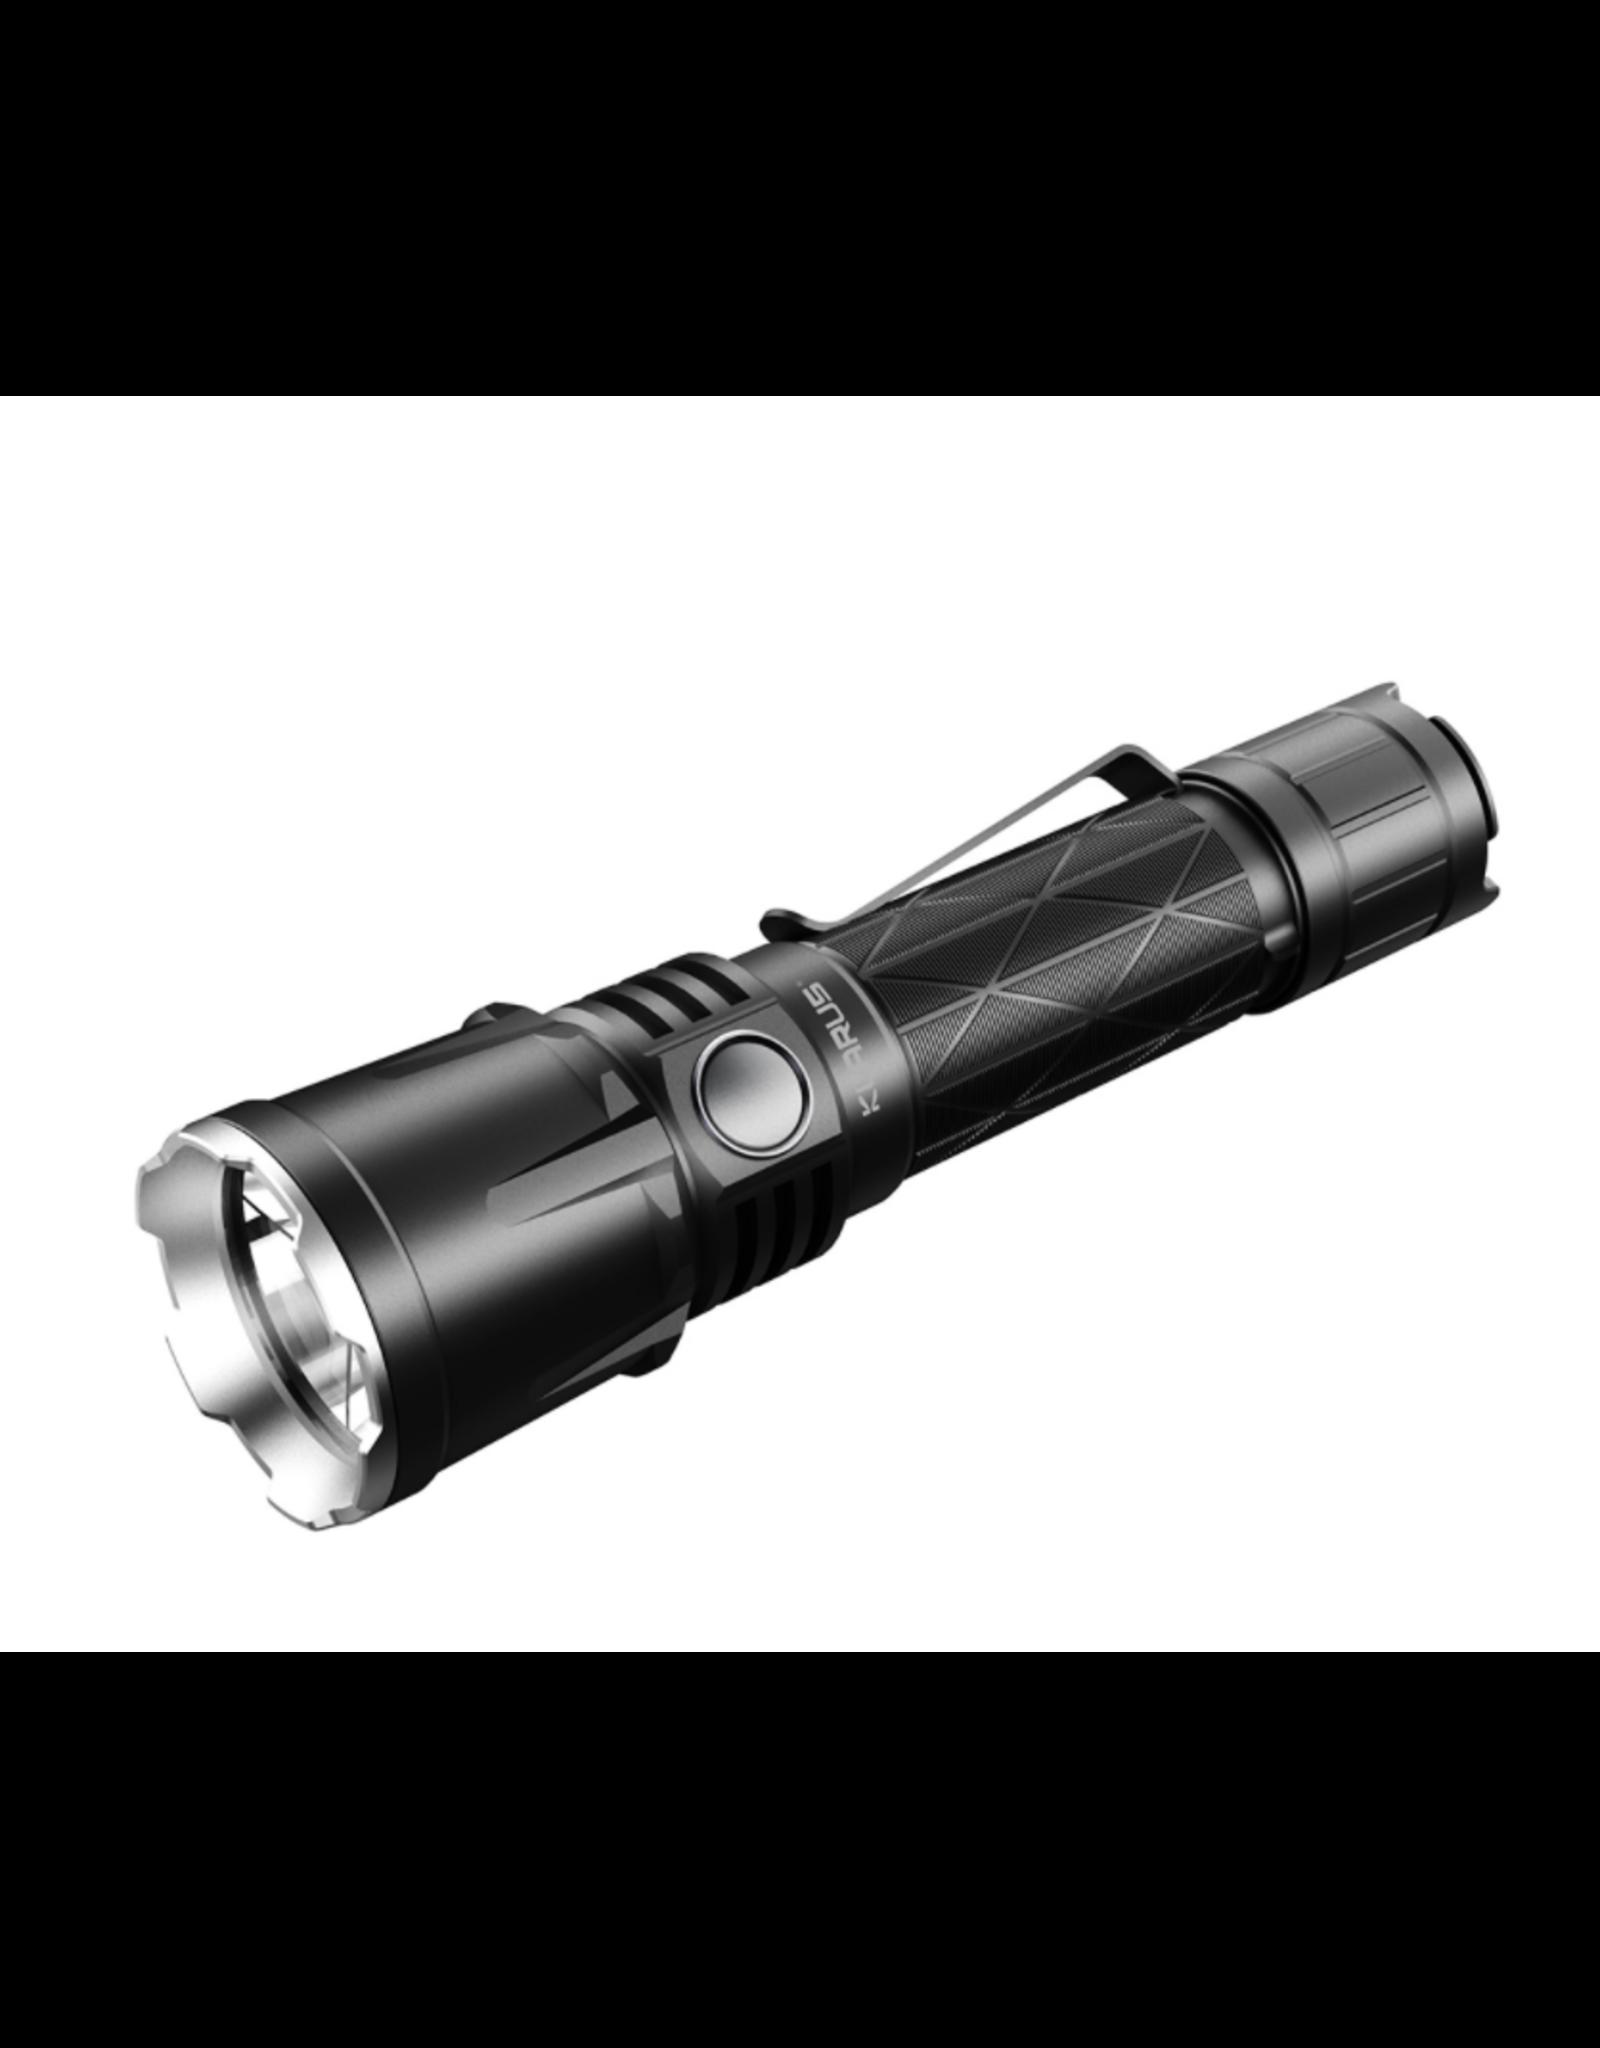 Klarus XT21X Flashlight 4000 Lumens